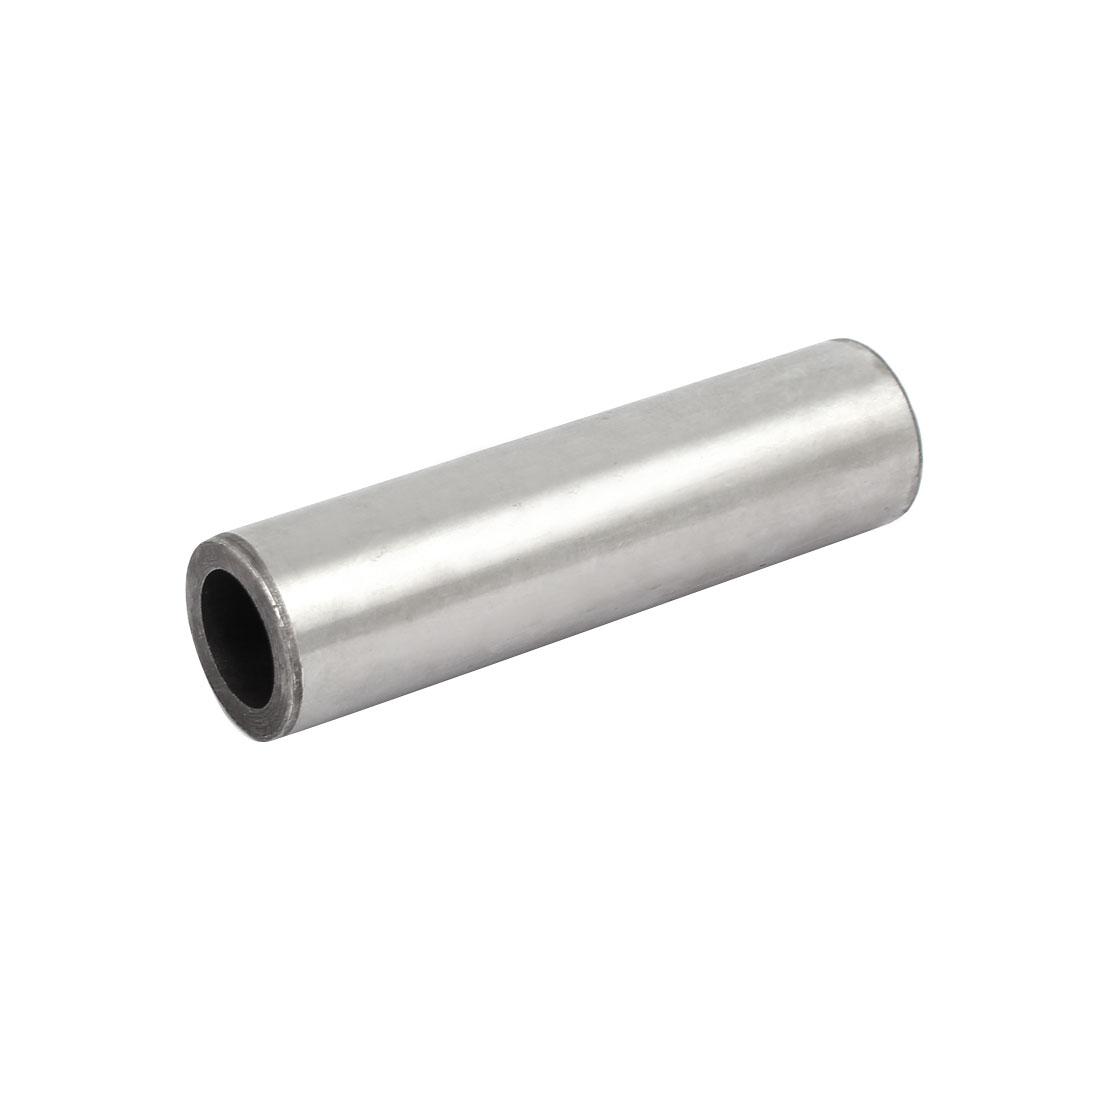 28mm OD 105mm Height Iron Piston Gudgeon Pin Air Compressor Accessory